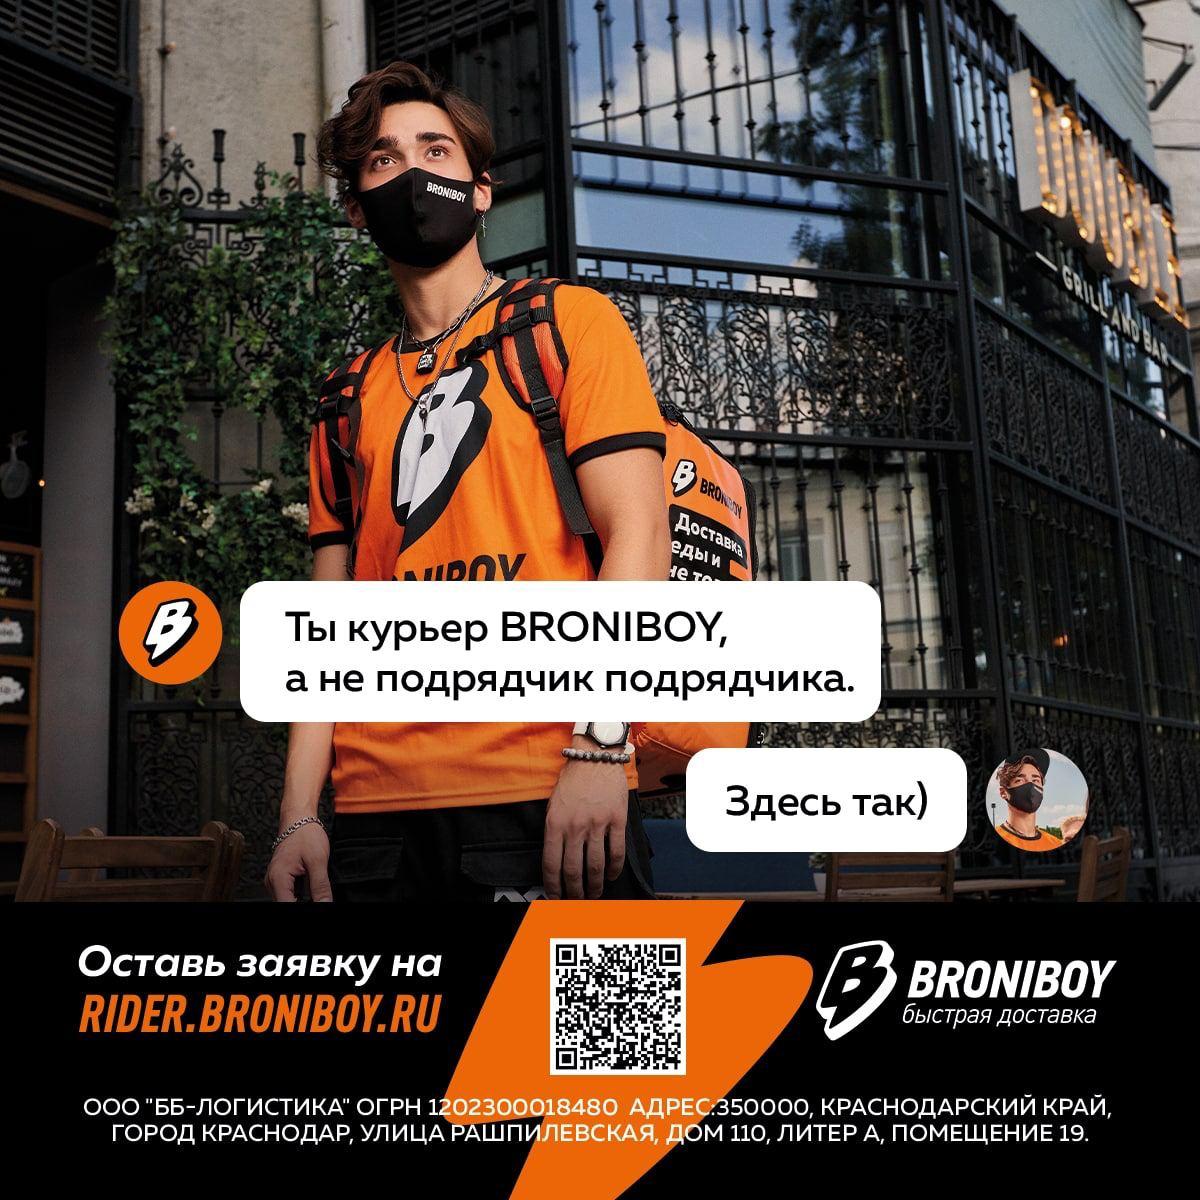 Курьер в Broniboy